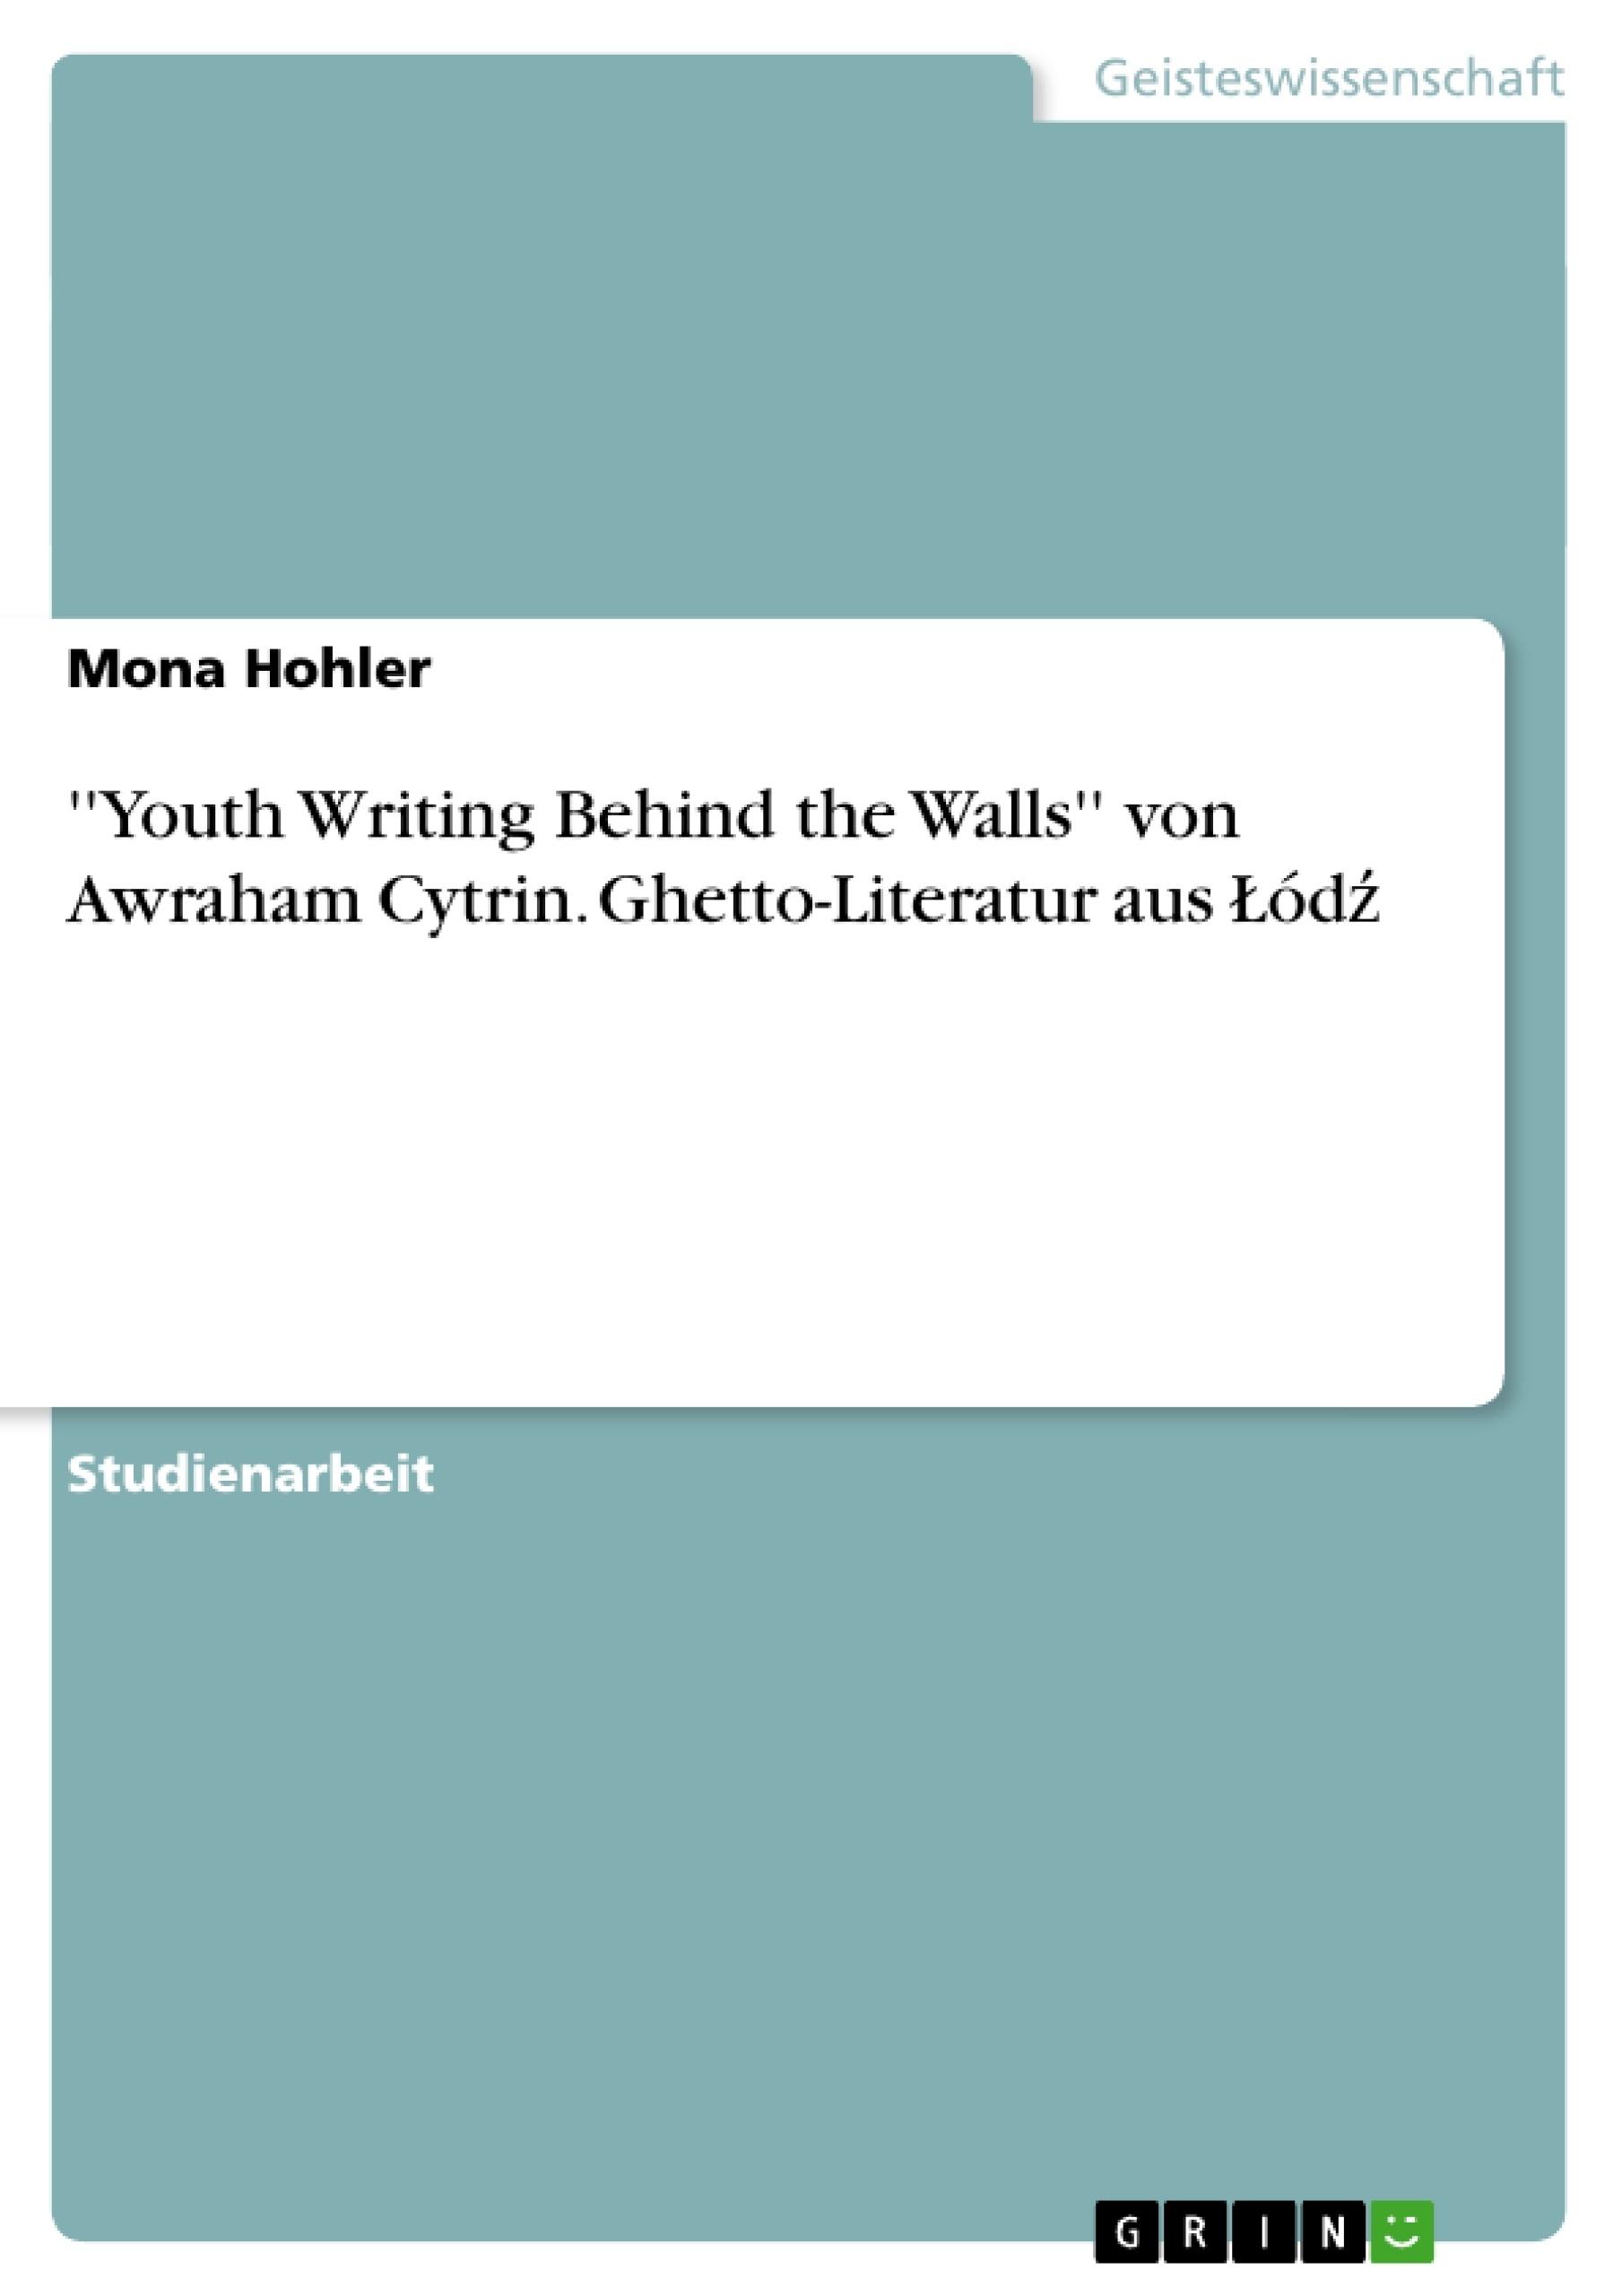 Titel: ''Youth Writing Behind the Walls'' von Awraham Cytrin. Ghetto-Literatur aus Łódź